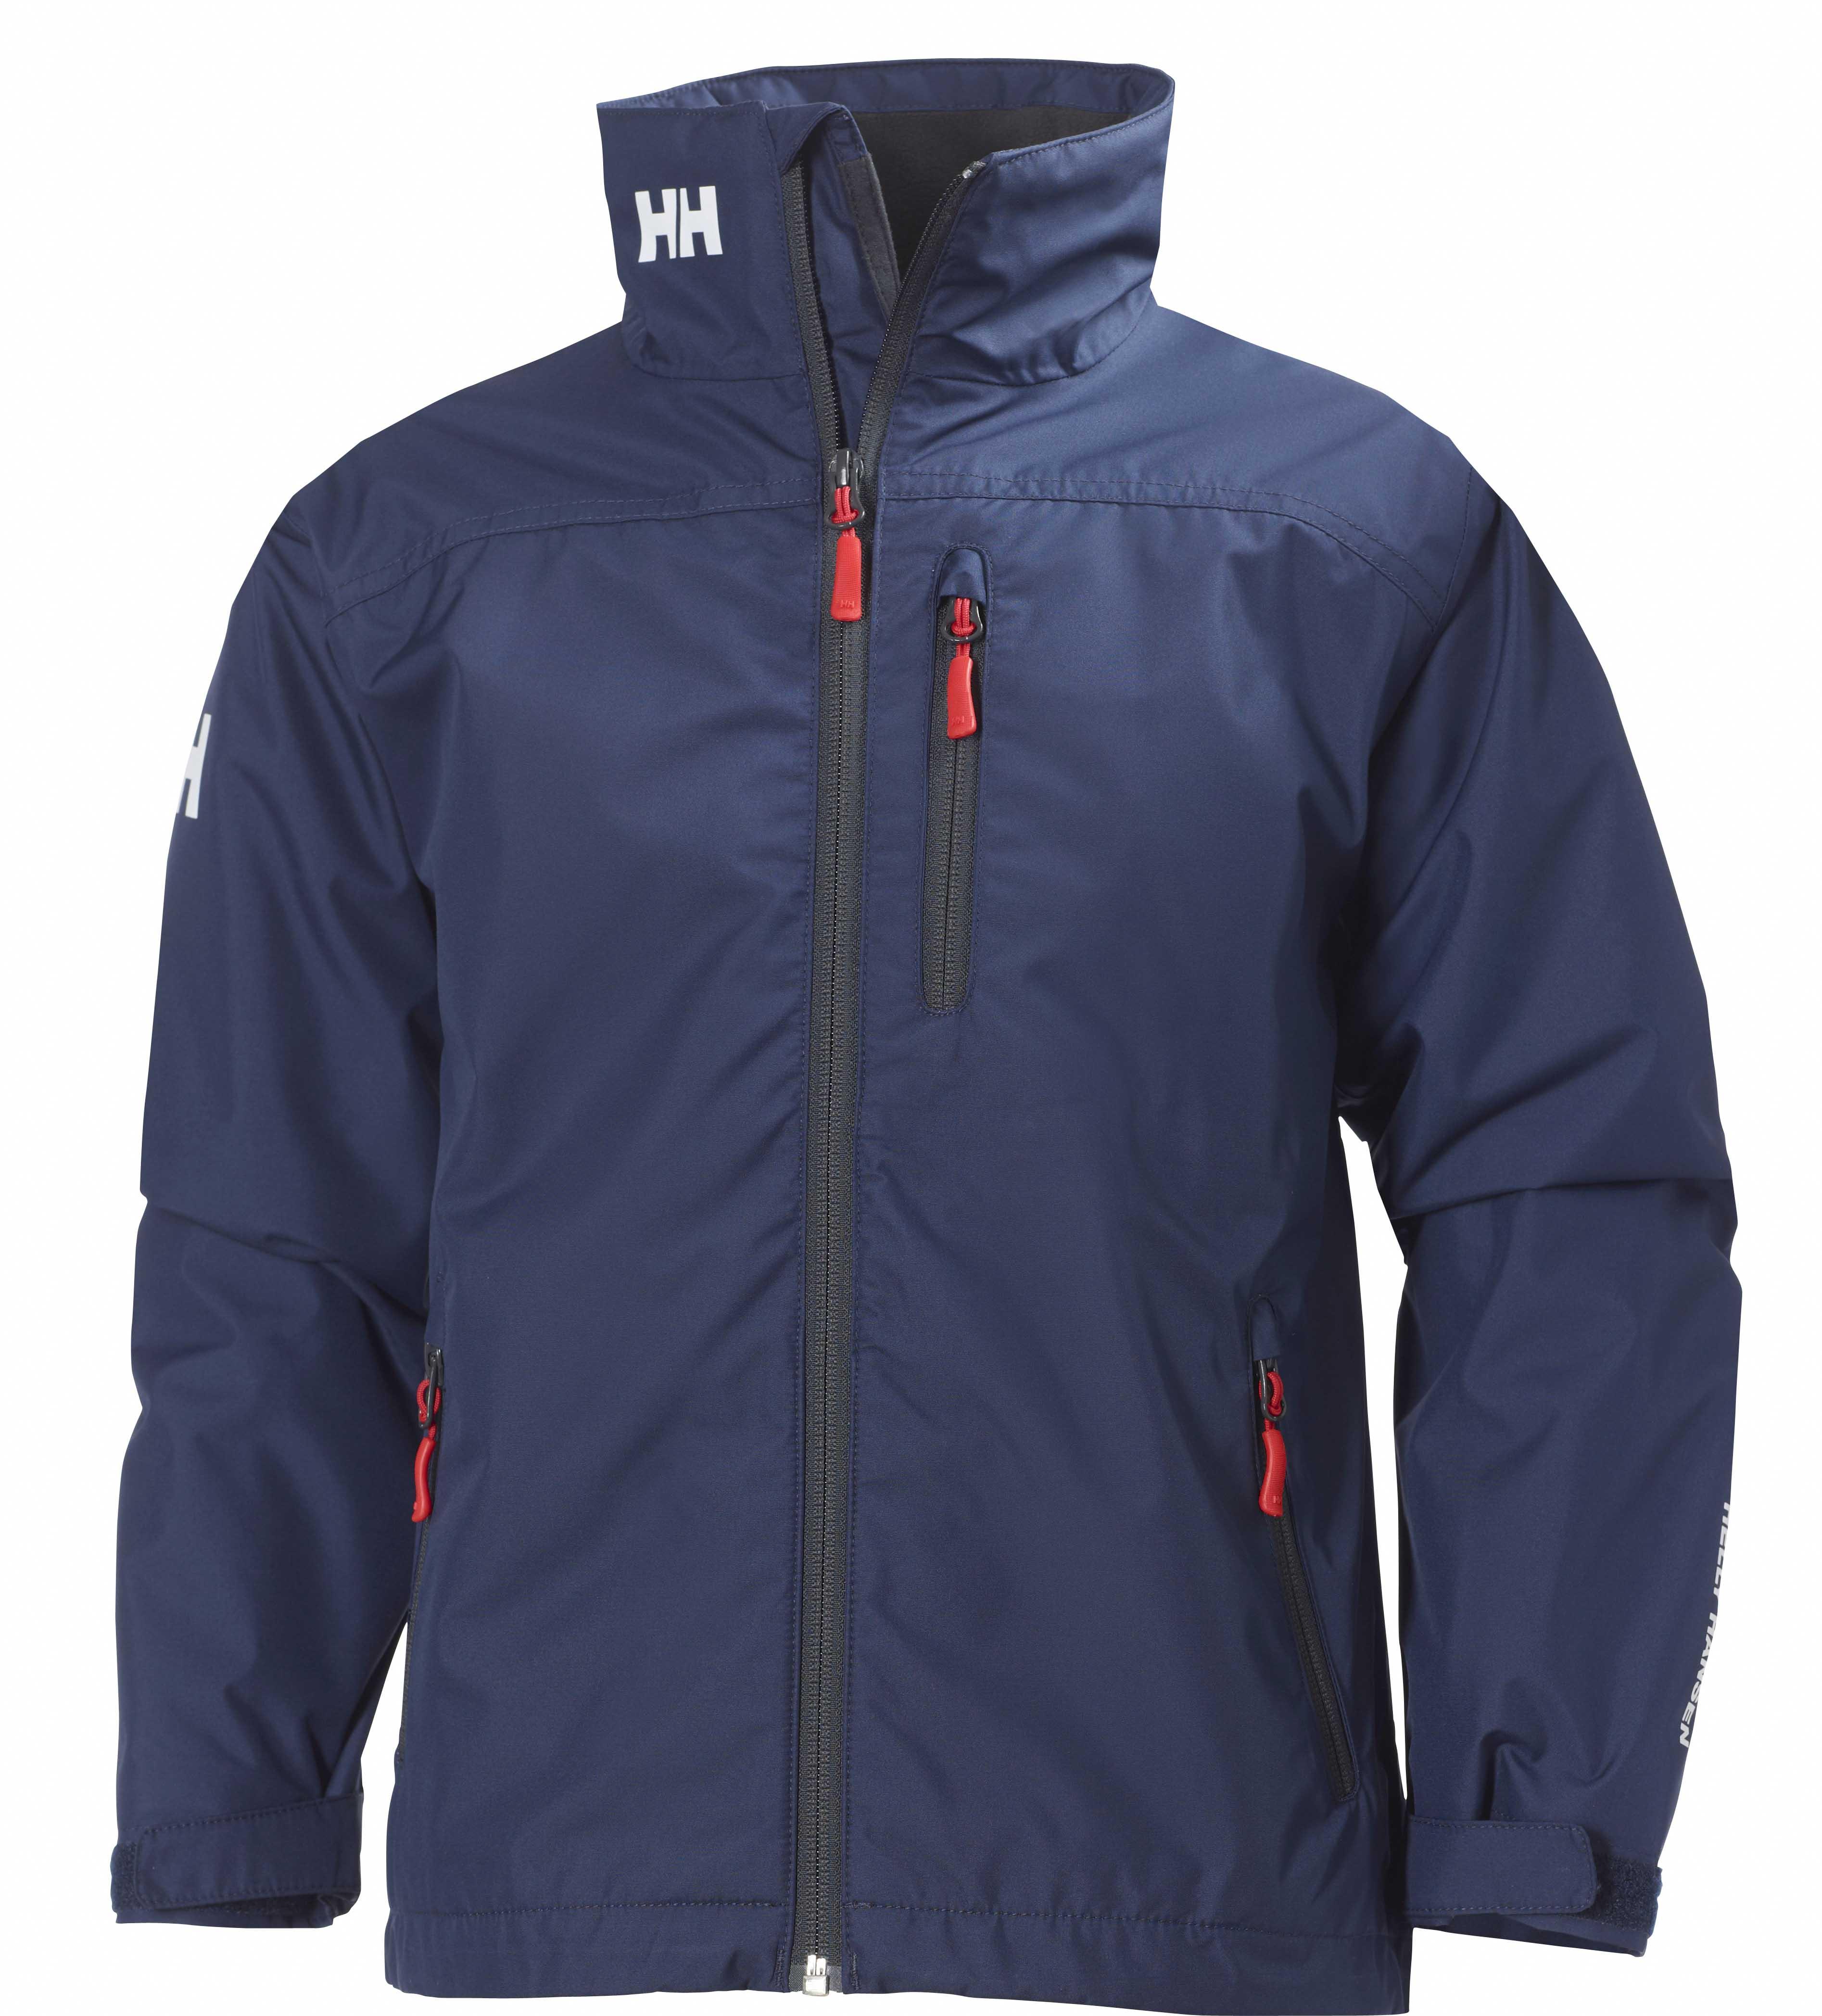 d003bf47 HH jr crew midlayer jakke-blå - Familiebutikken.no